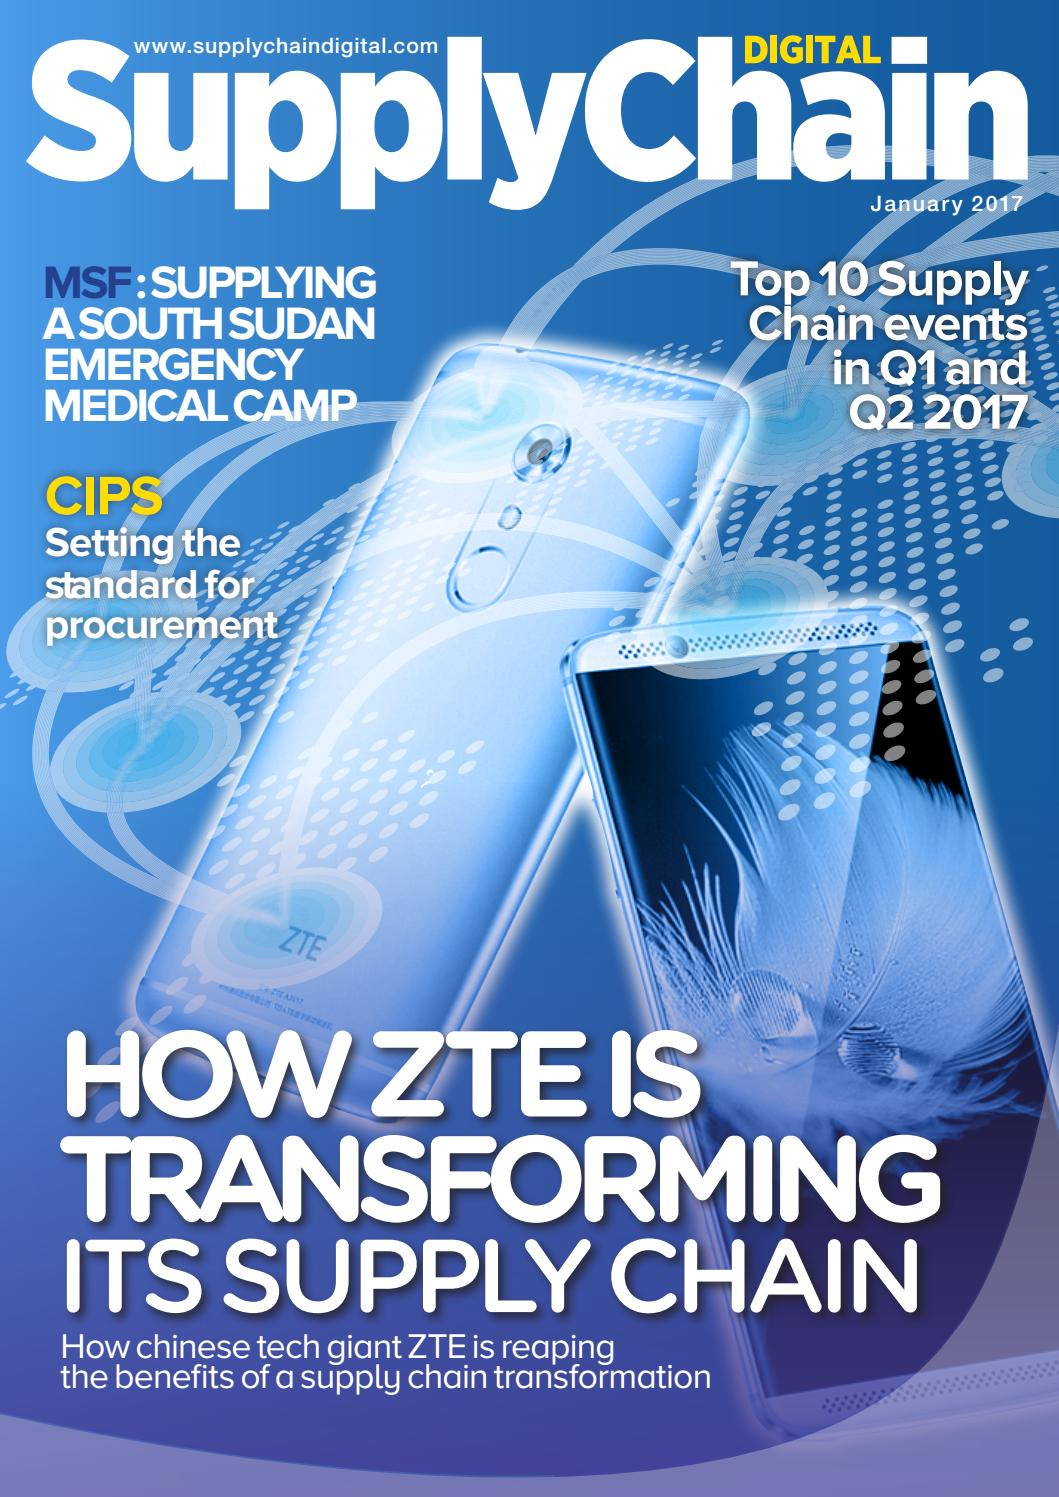 Supply Chain Digital - Brochure 2017 by Supply Chain Digital